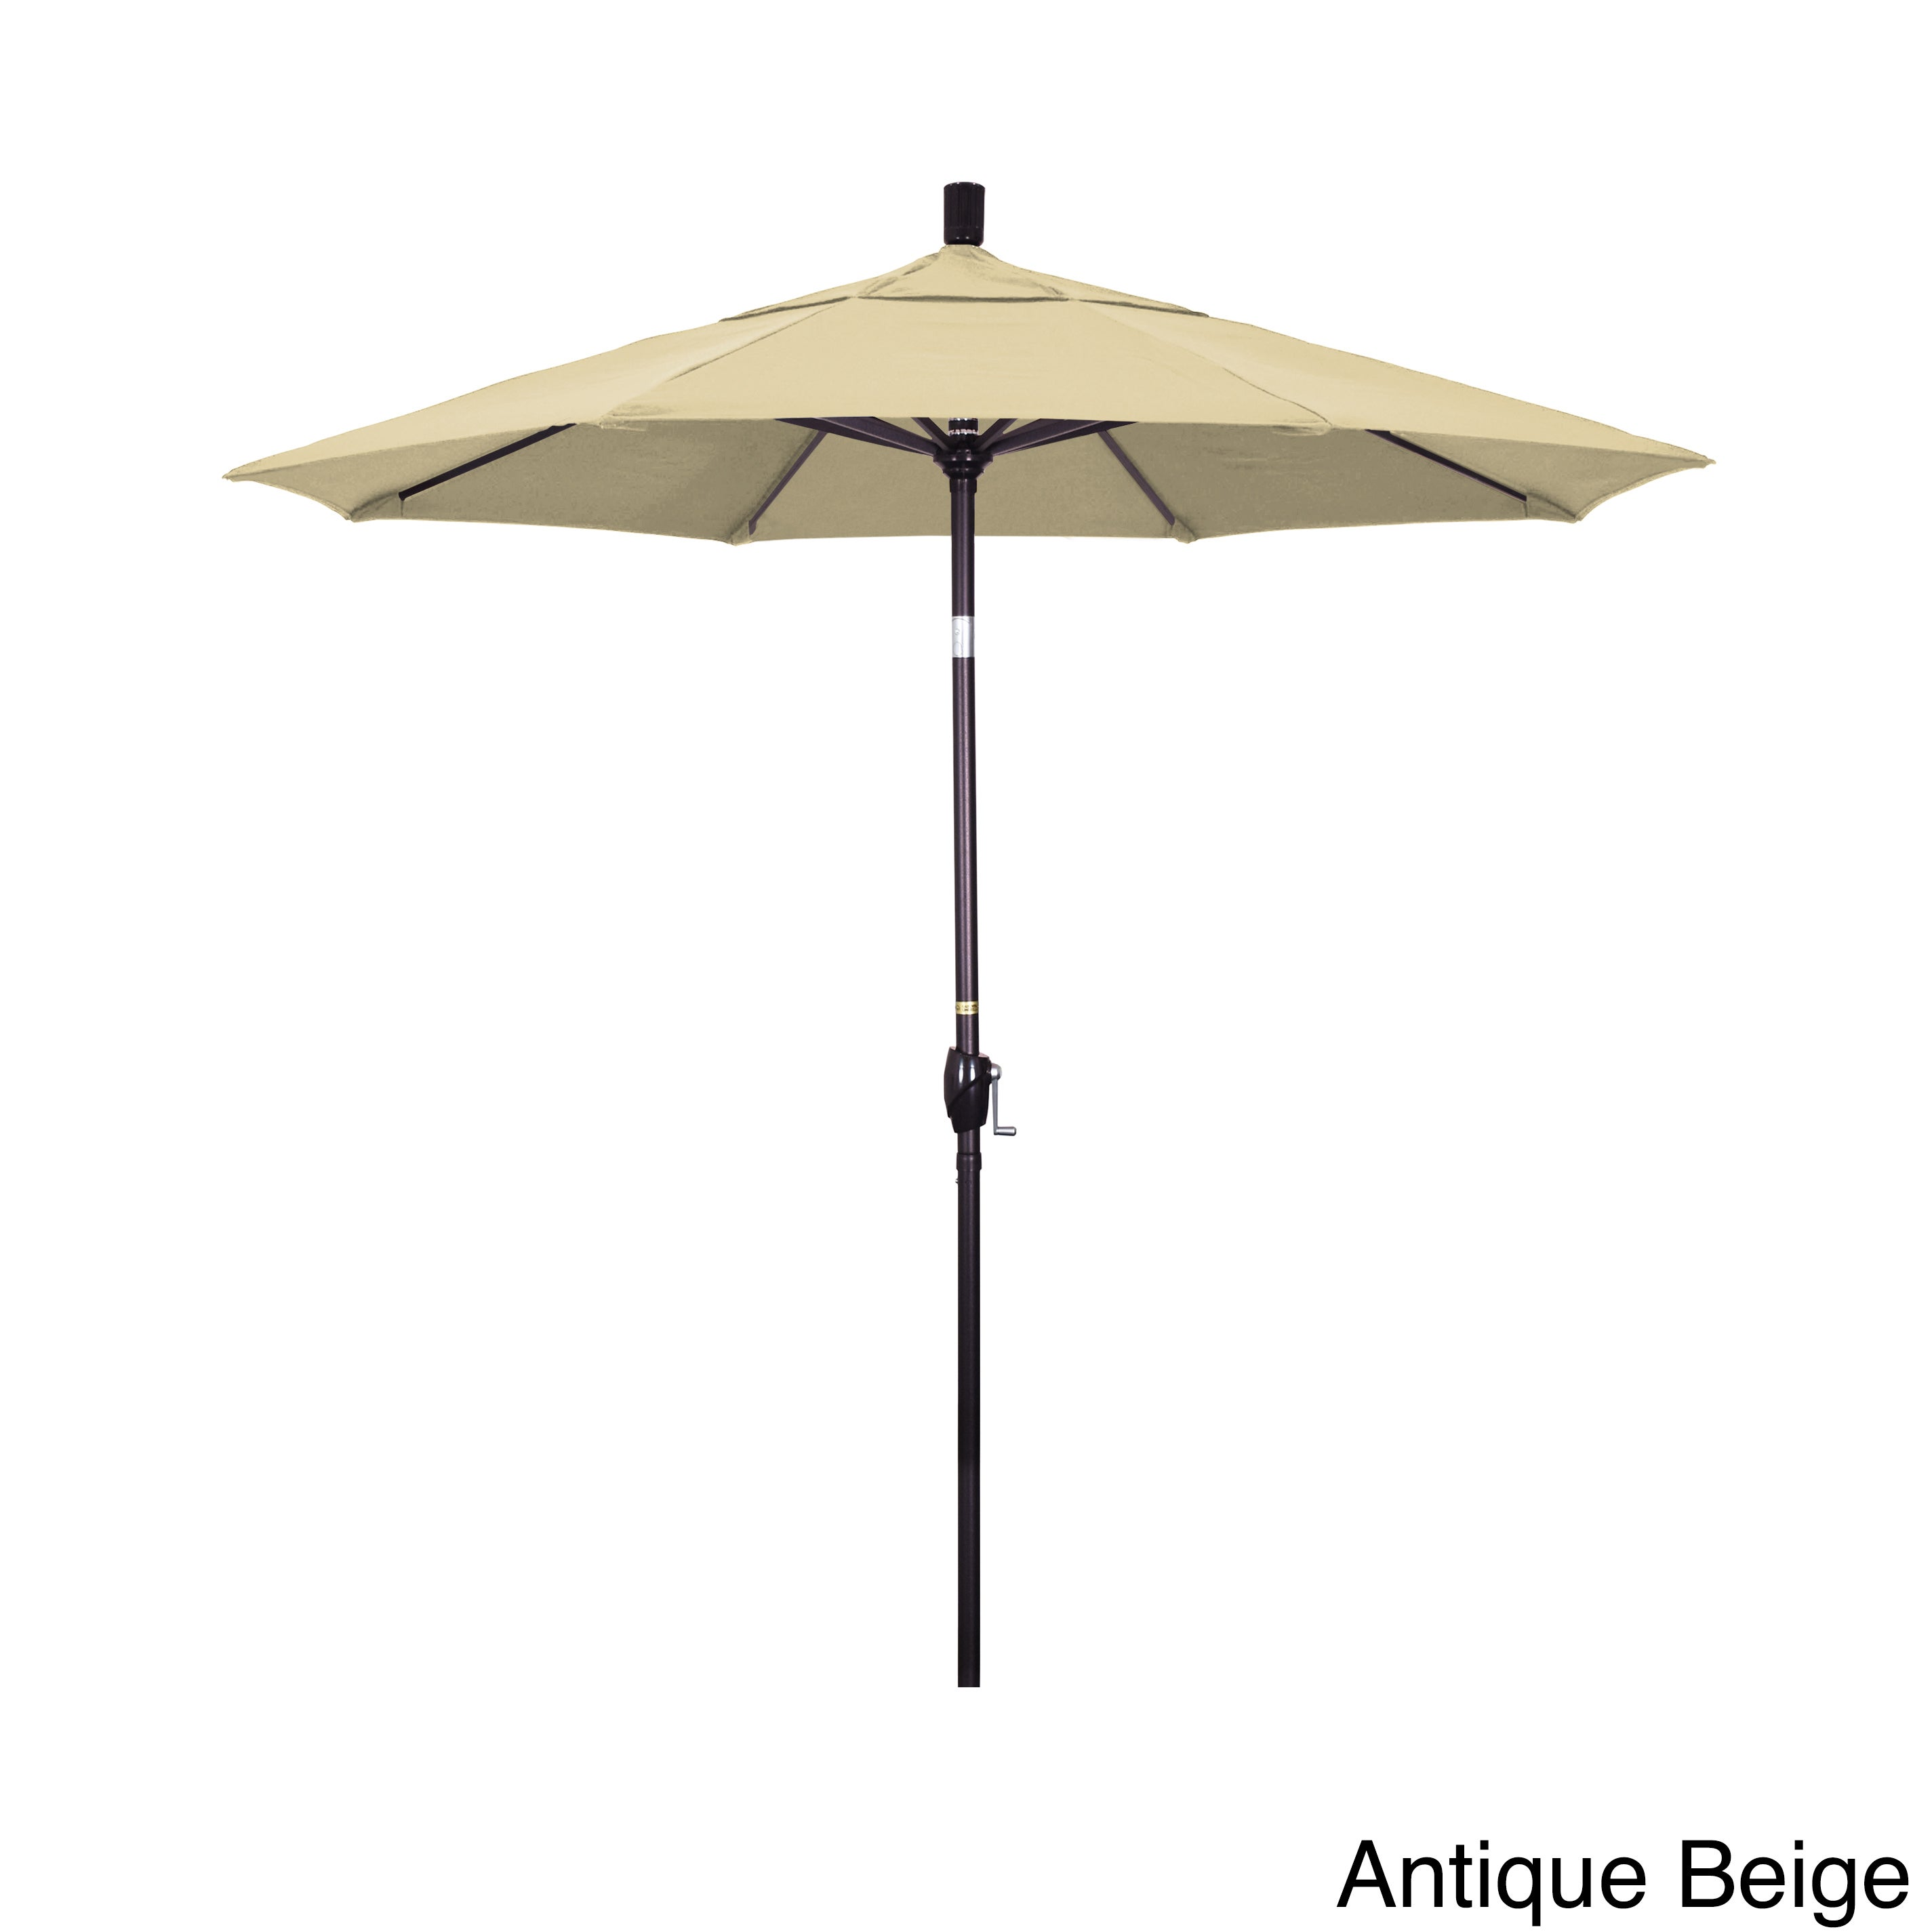 California Umbrella 7 5 Rd Aluminum Market Umbrella Crank Lift With Push Button Tilt Bronze Finish Olefin Fabric Overstock 11976361